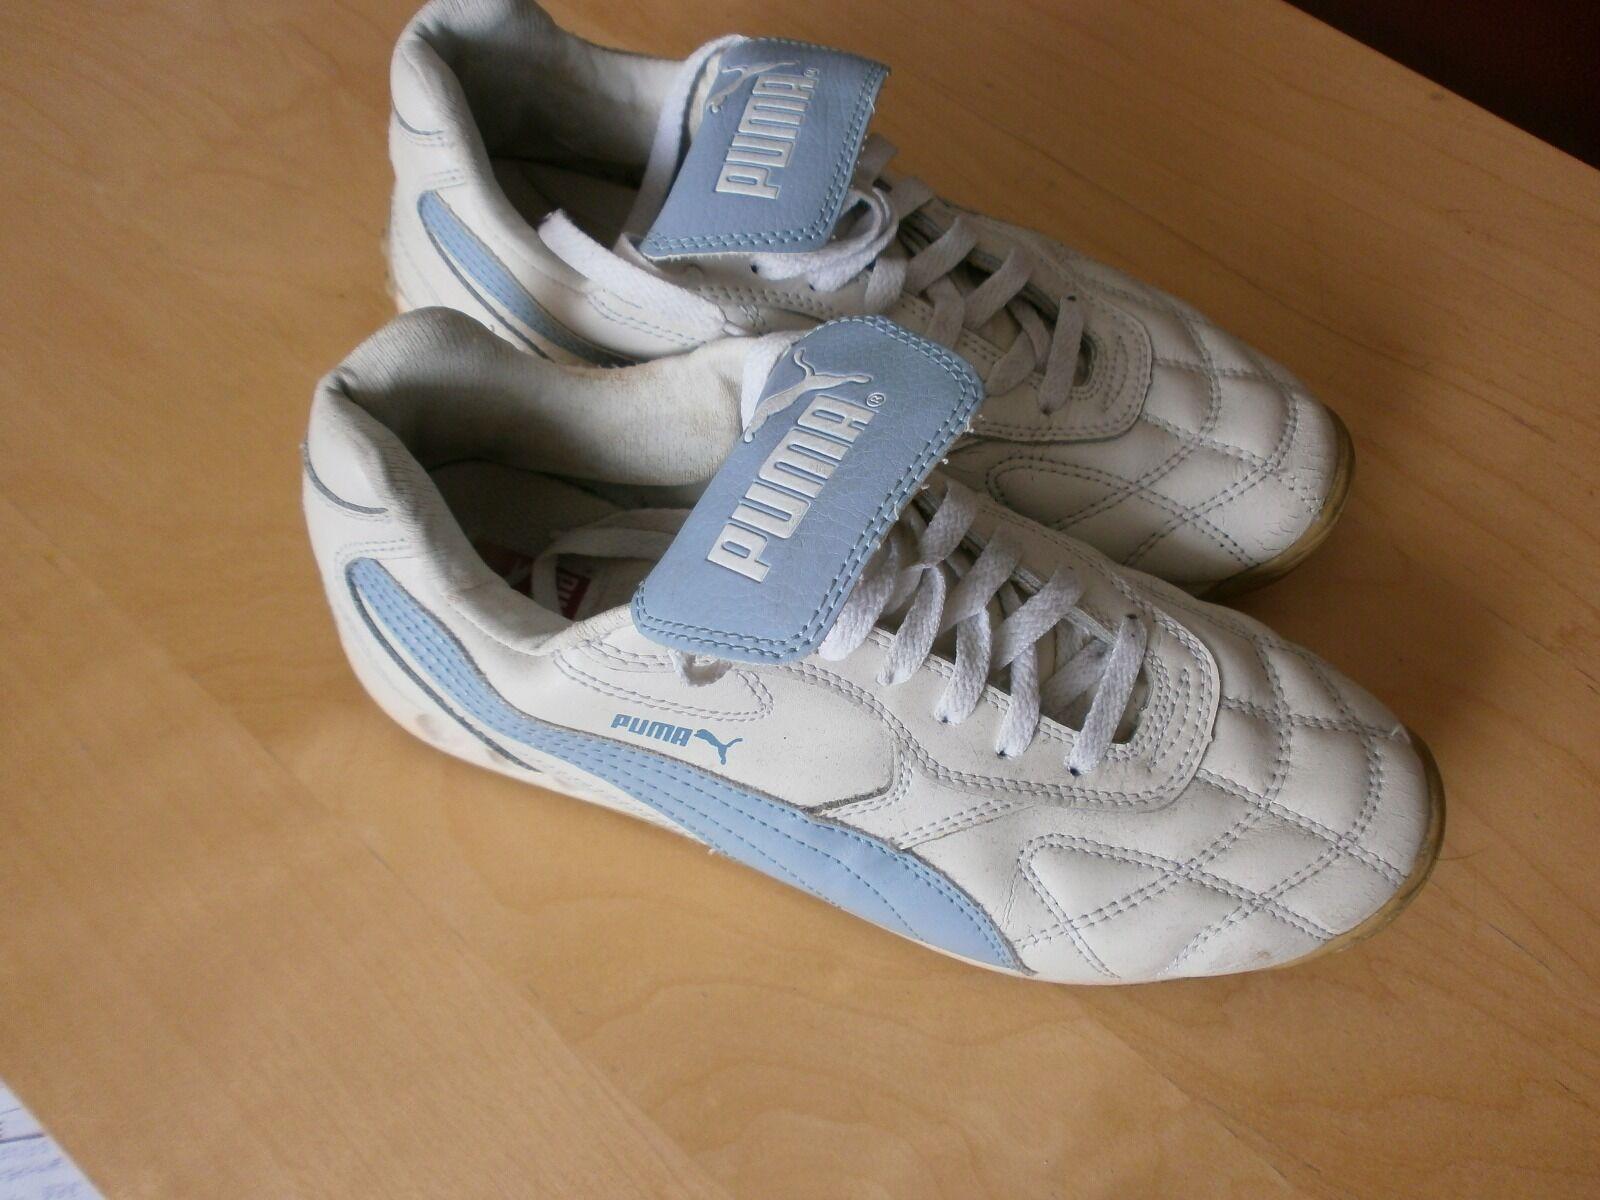 Puma Puma Puma Avanti Lederschuh Sneaker blau/weiß Größe 43 b225ea